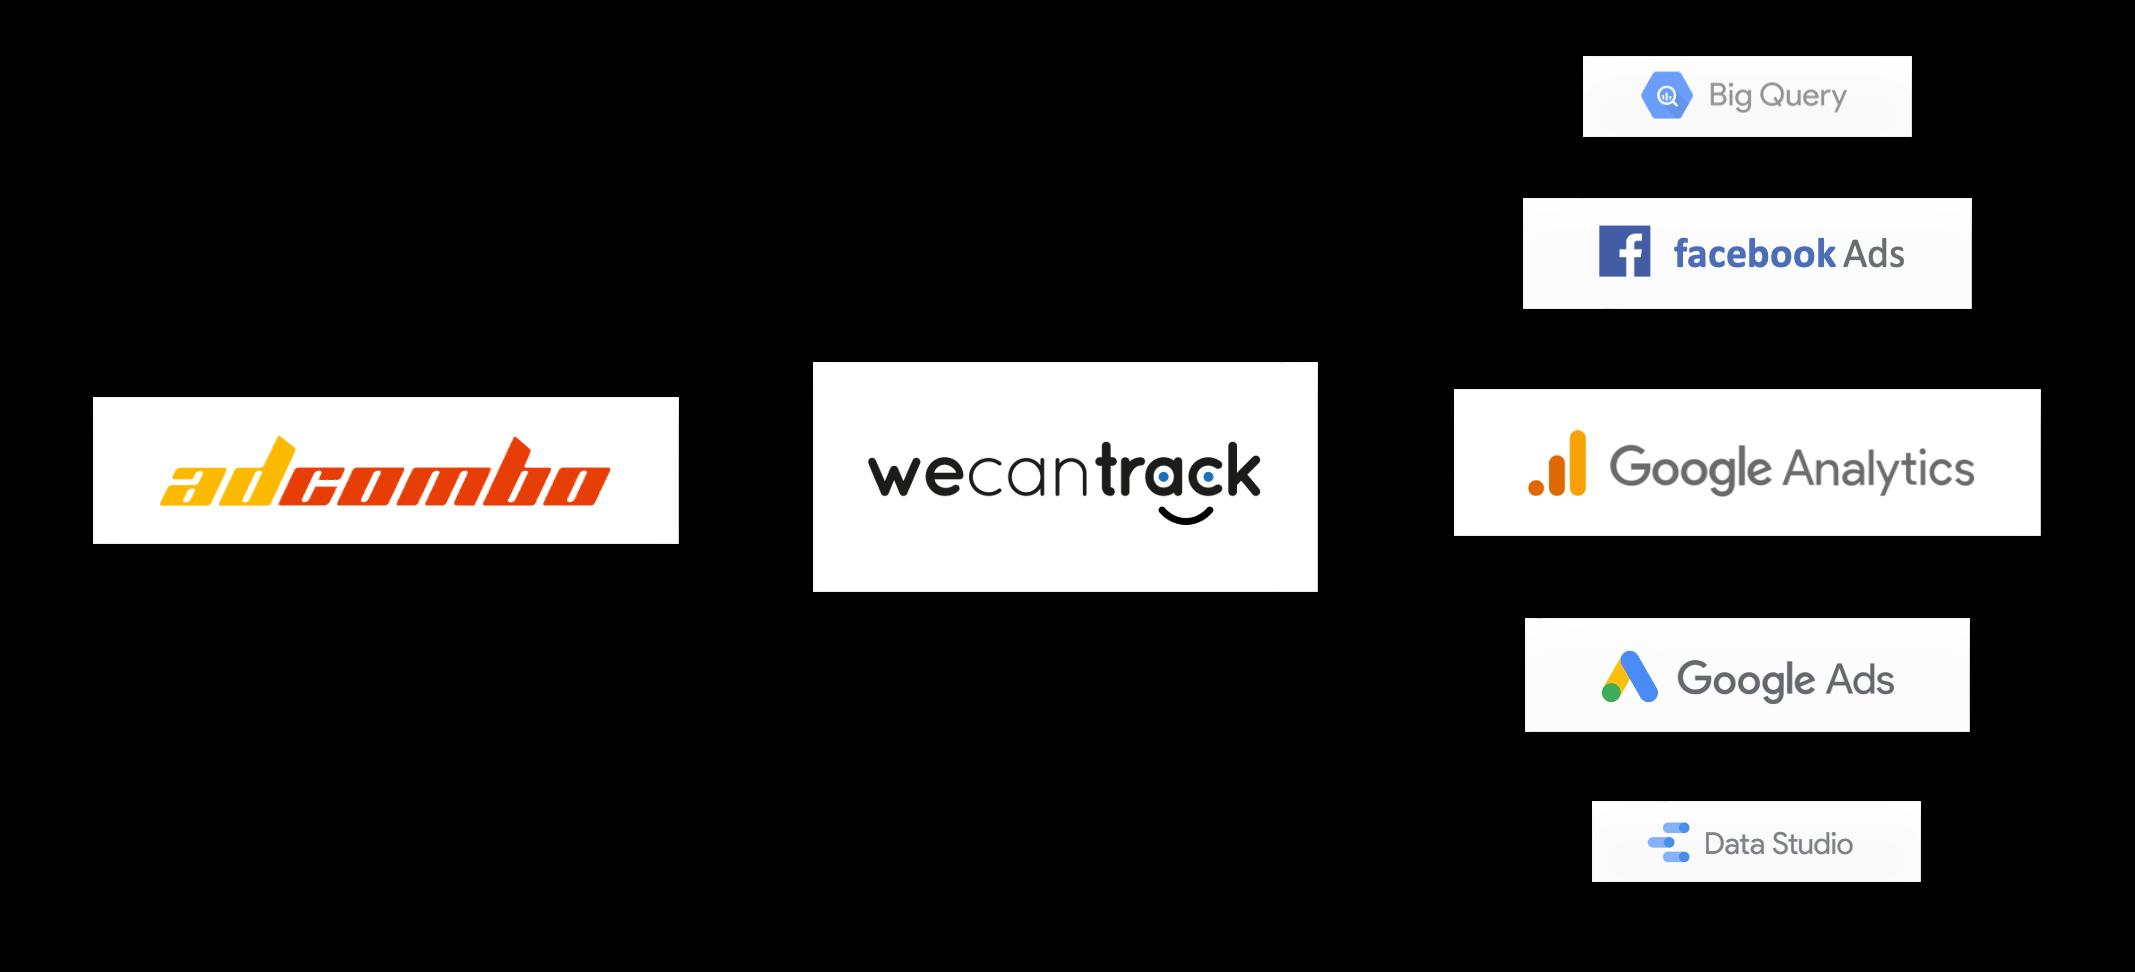 adcombo-affiliate-conversion-integration-via-postback-url